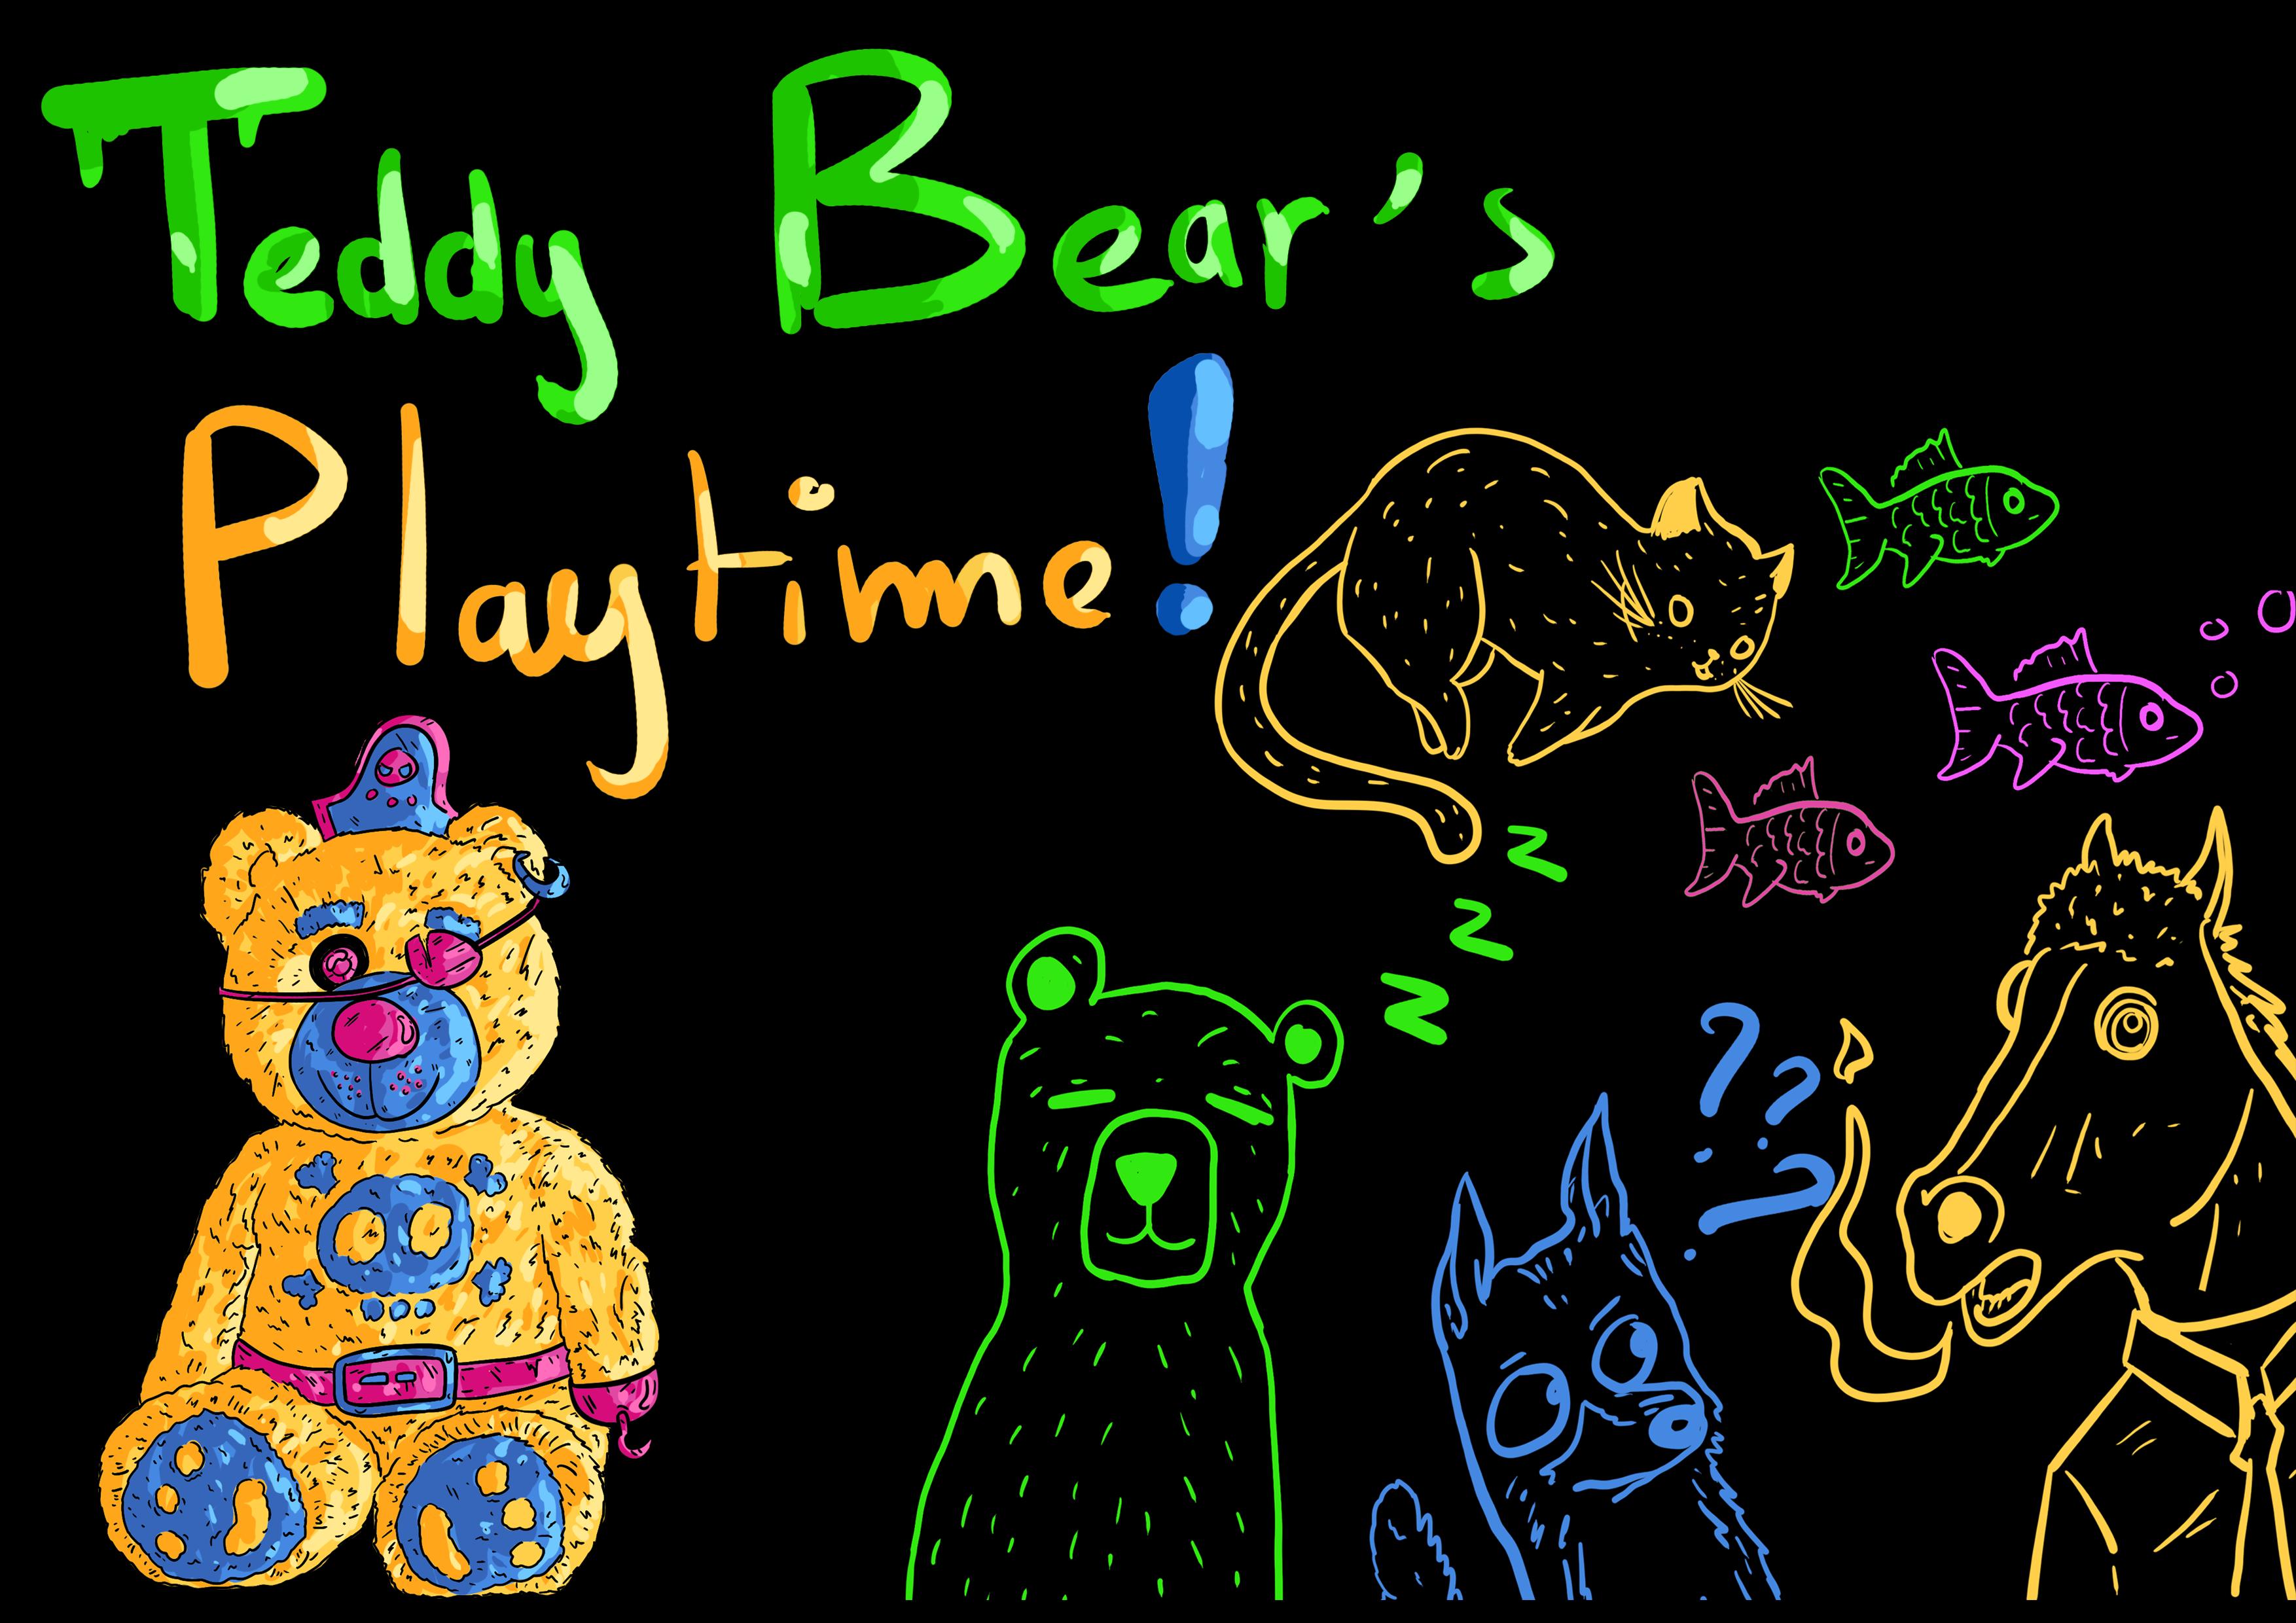 Teddybear's Playtime